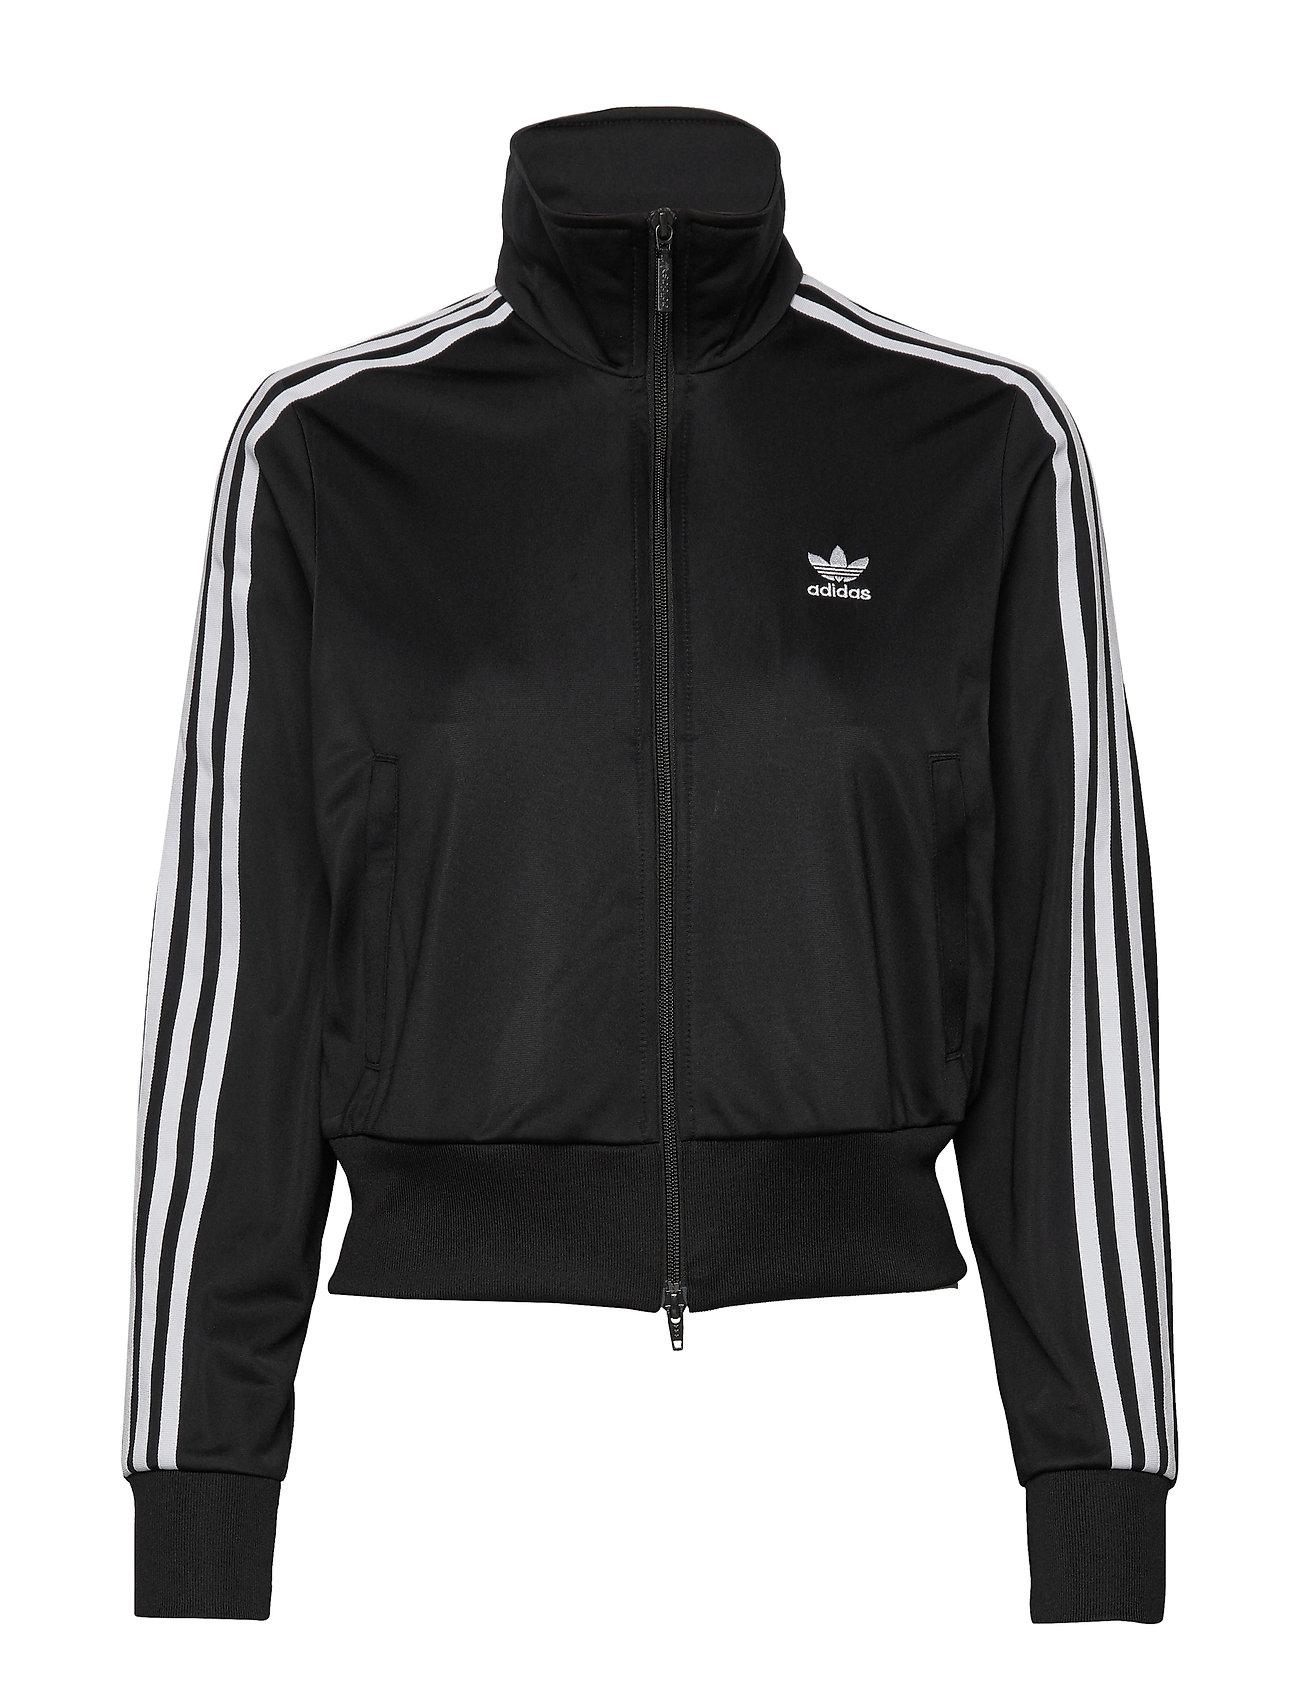 adidas Originals FIREBIRD TT - BLACK/WHITE